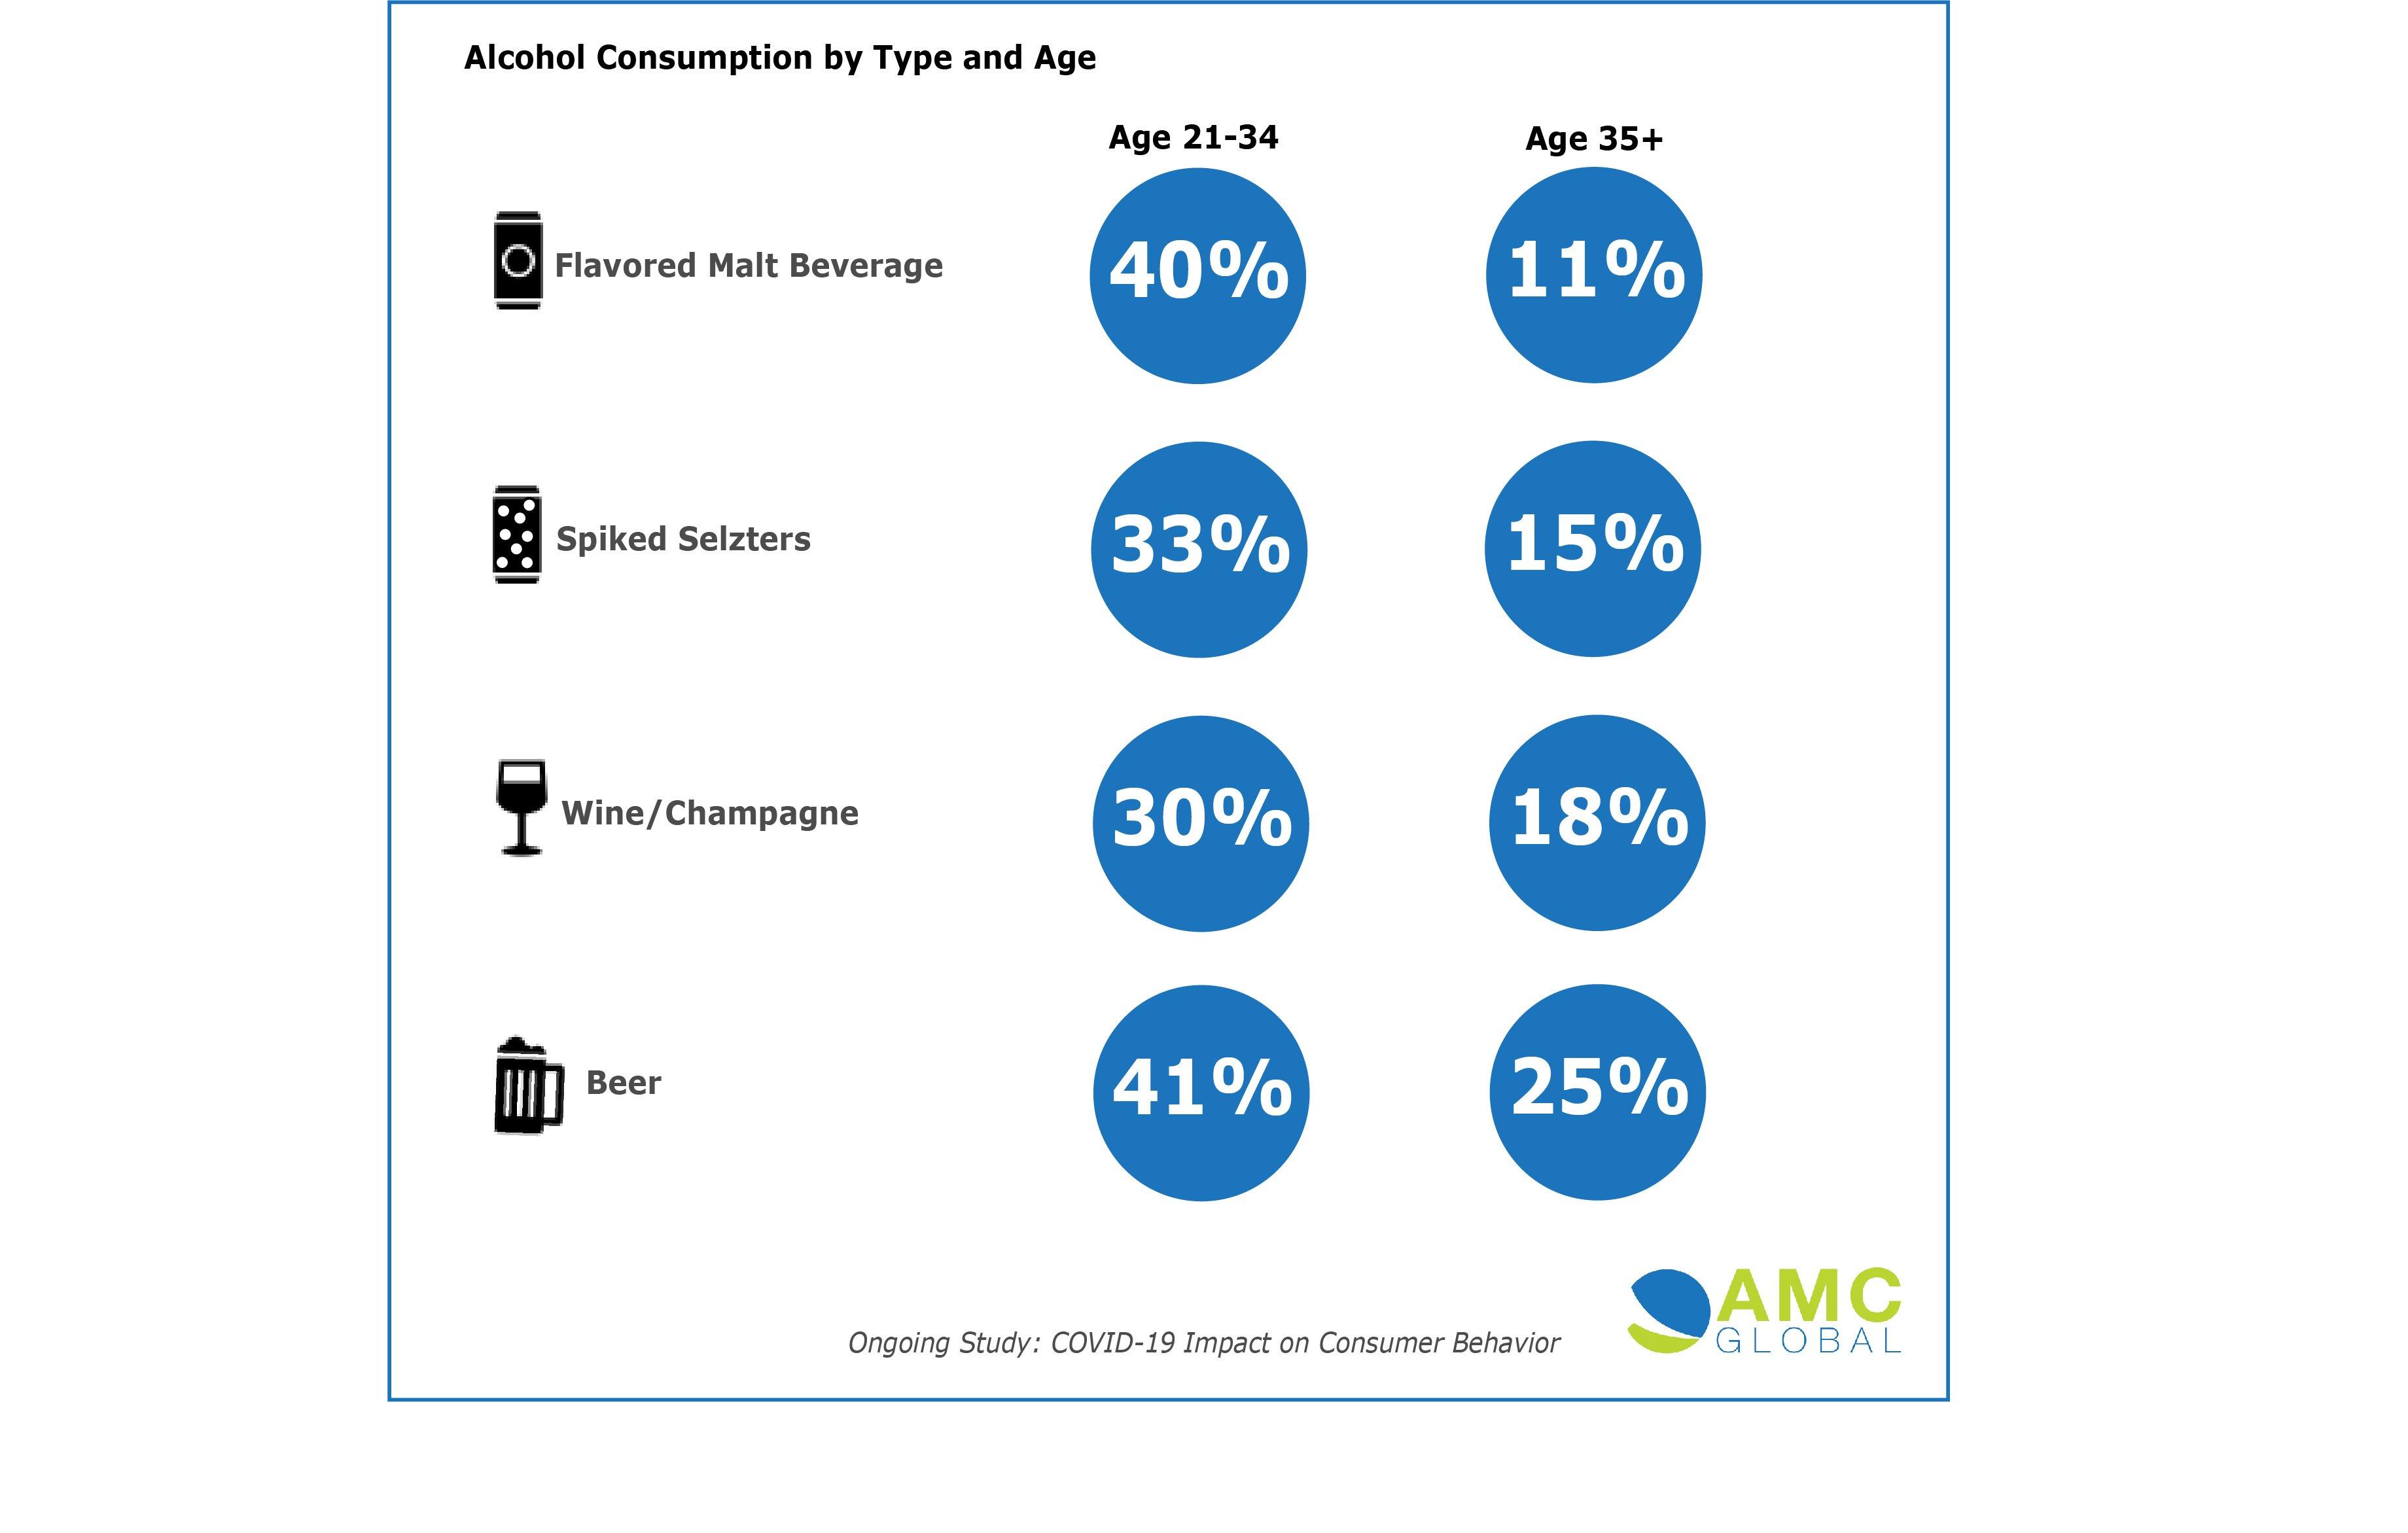 AMC Alcohol Consumption by Age